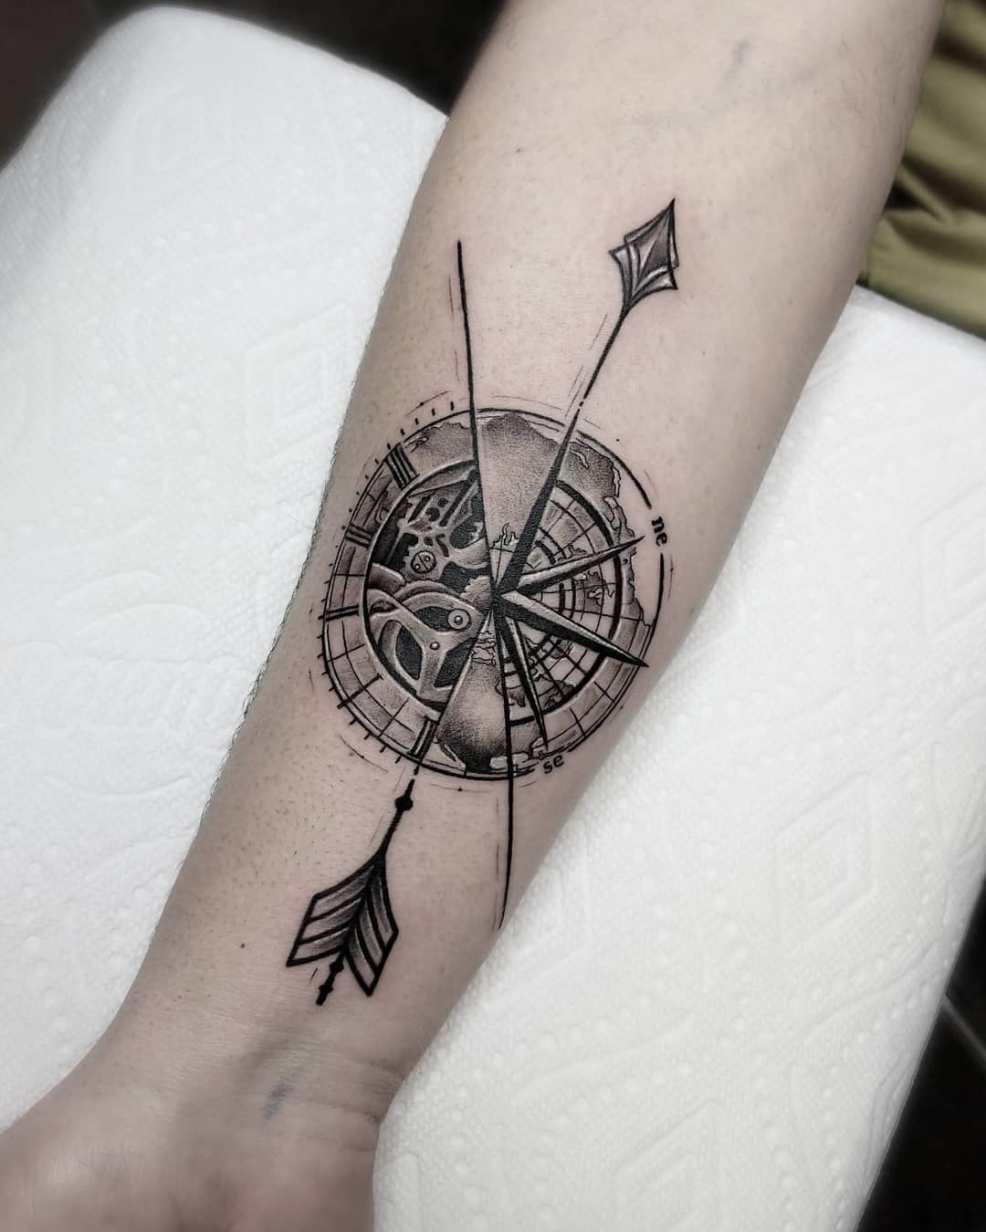 65 фото татуировка часов на руке символ времени Tattooassist